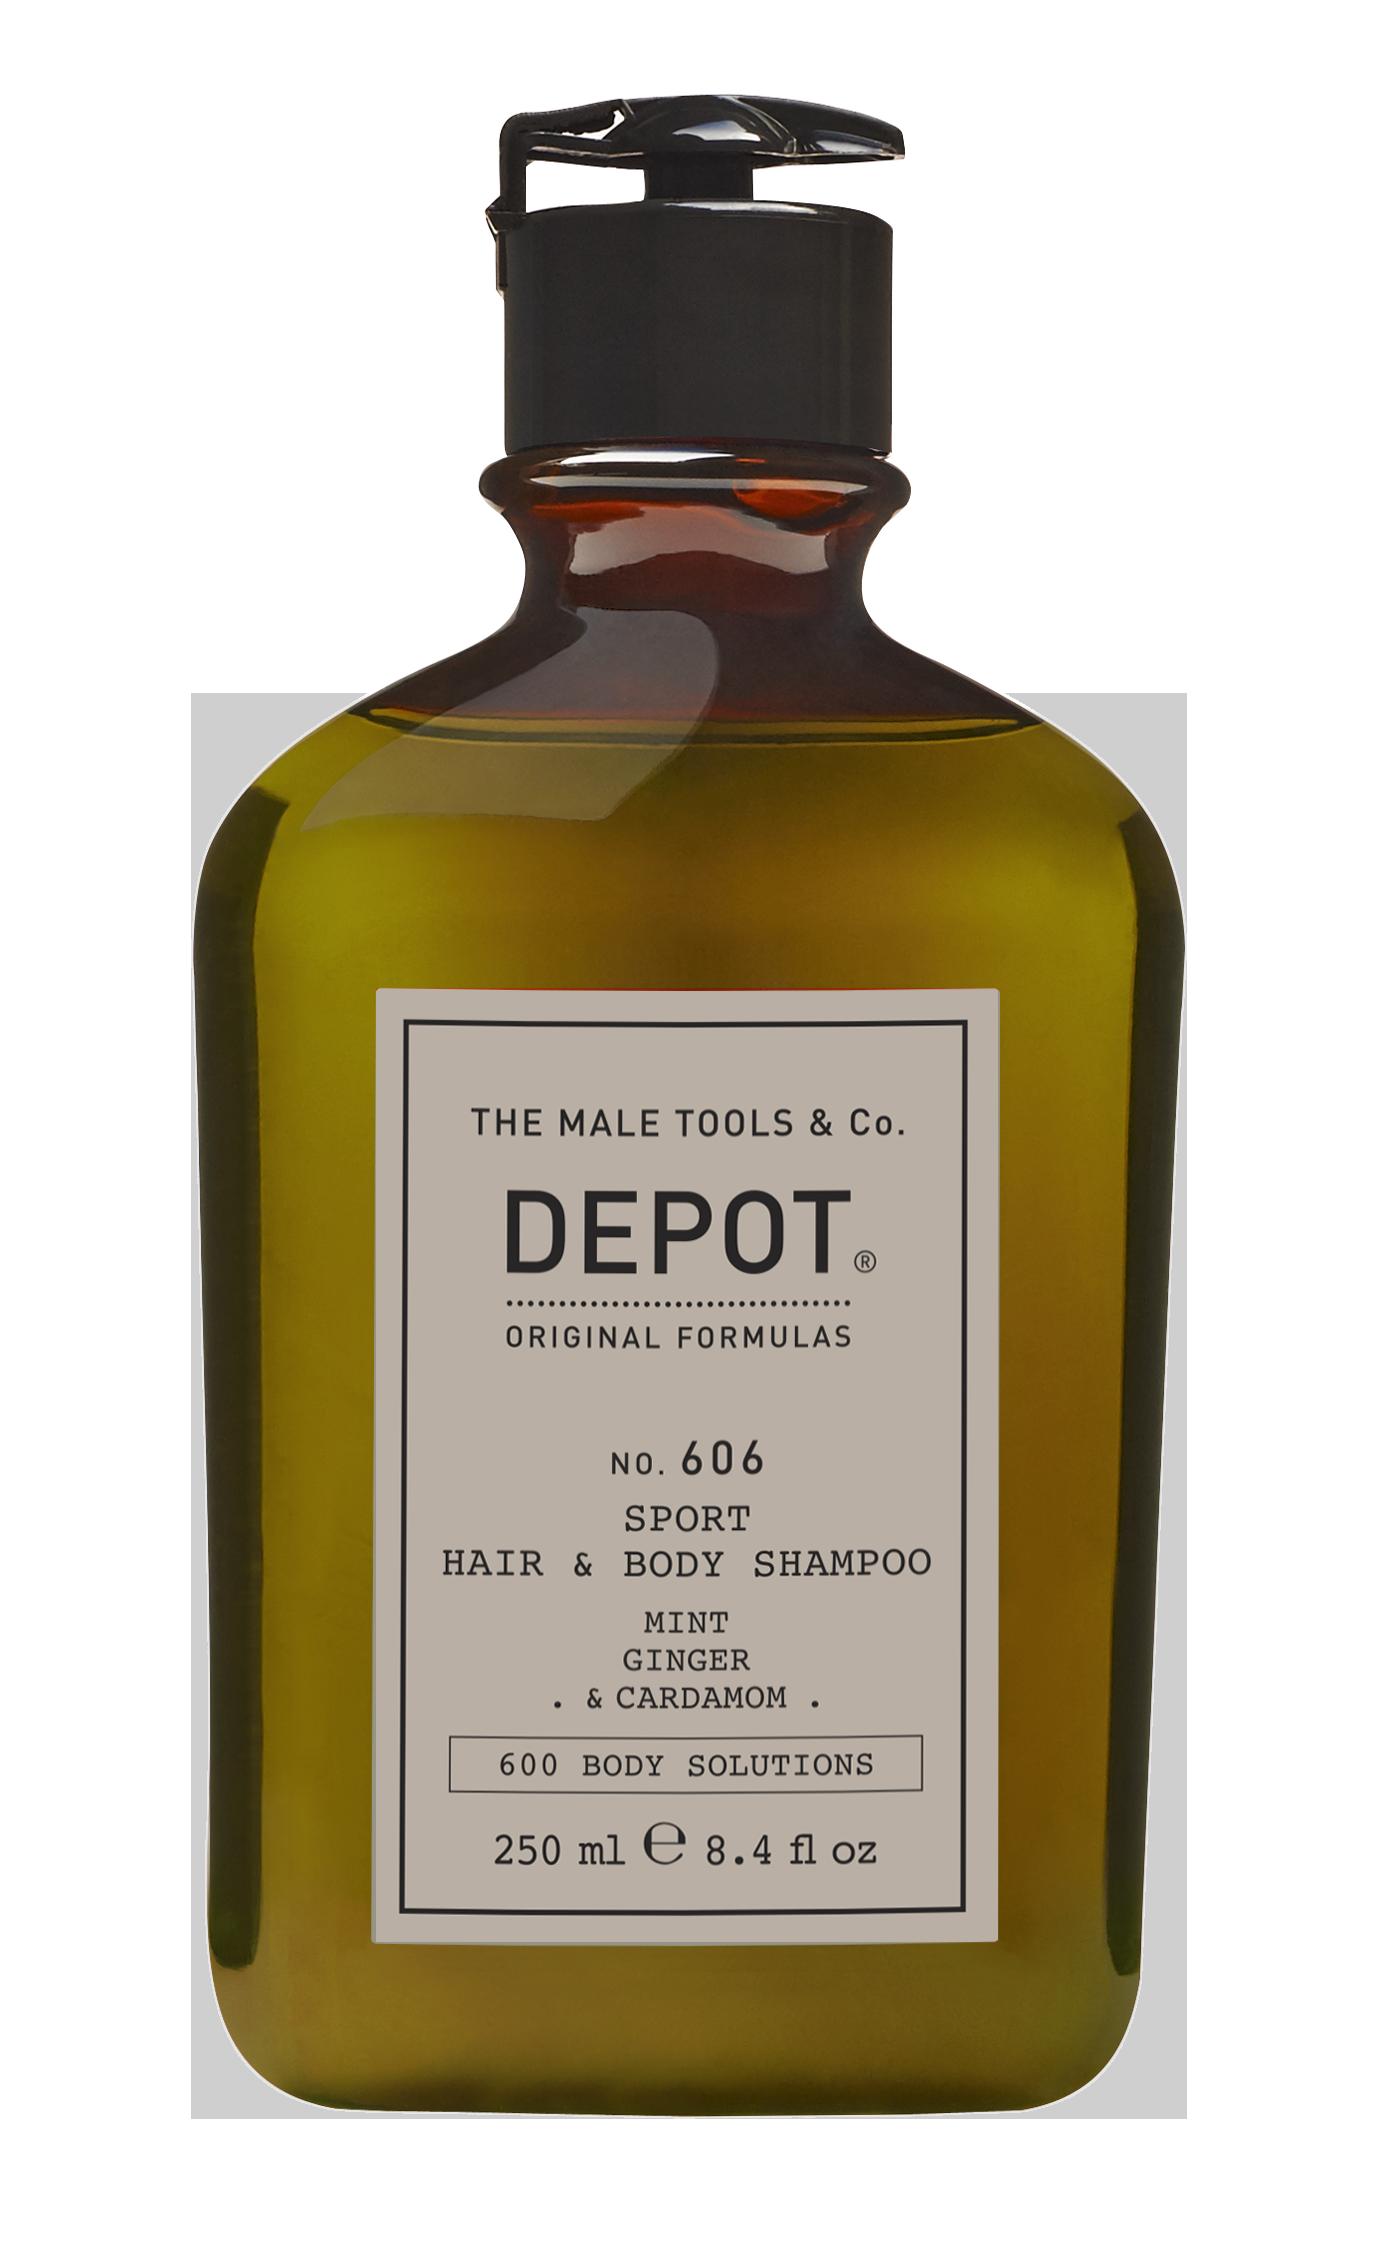 Depot - No. 606 Sport Hair & Body Shampoo - 250 ml